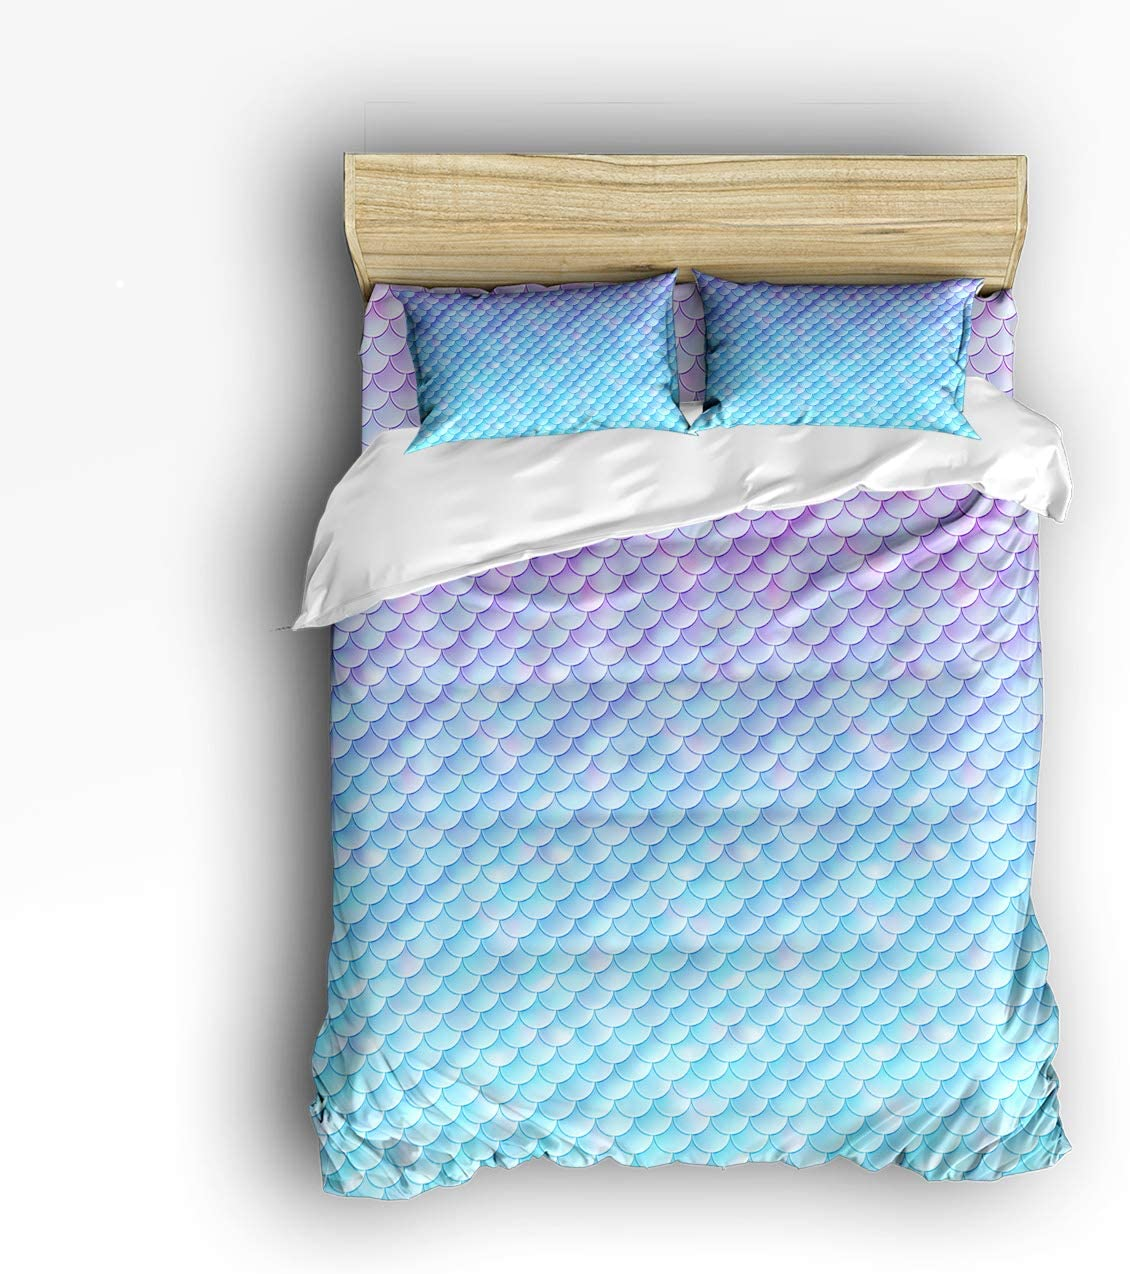 Amazon.com: 4 Piece Polyester Fabric Duvet Cover Set with Zipper